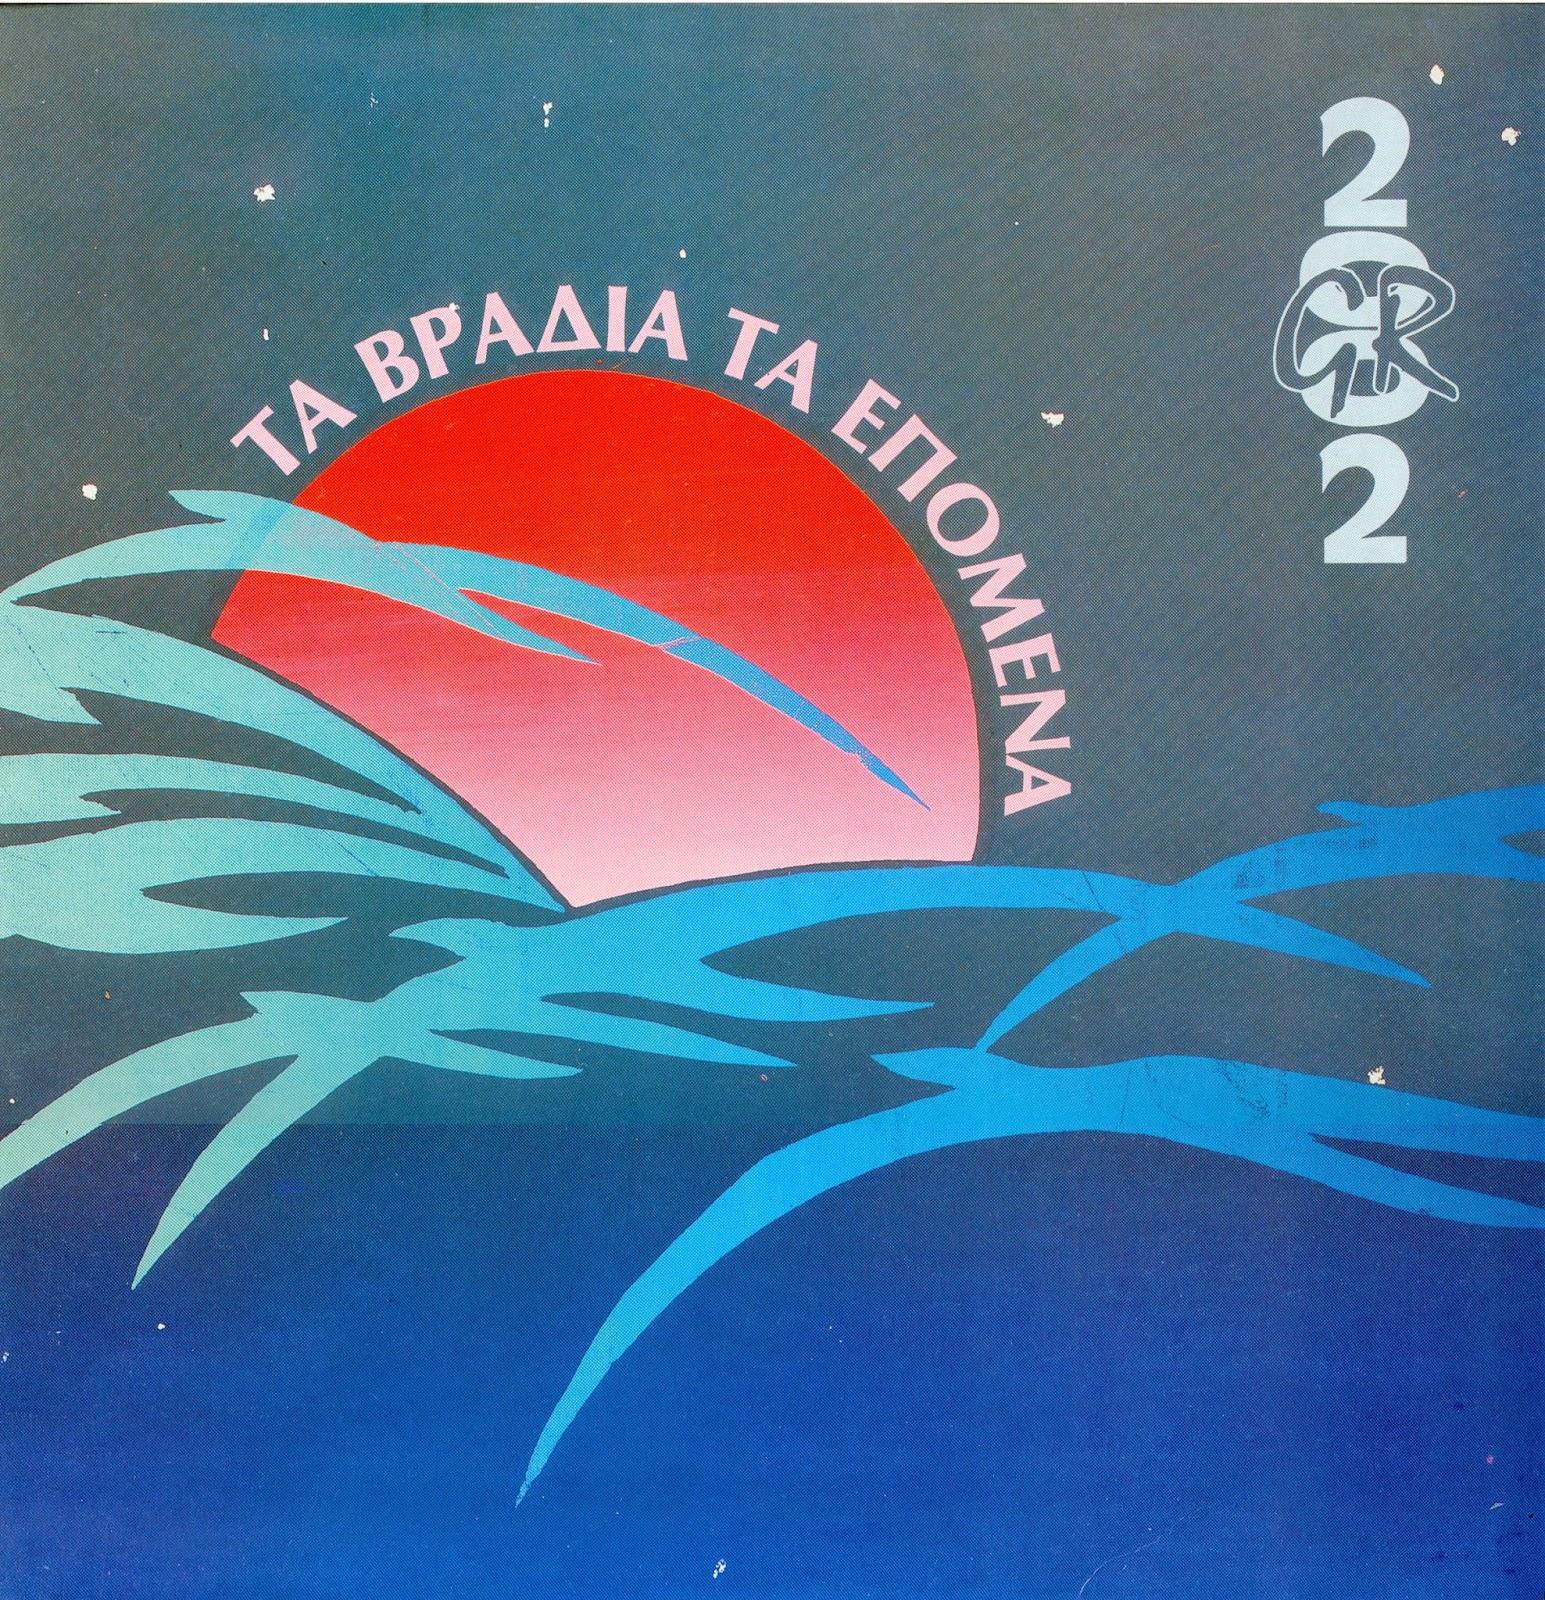 2002 GR – Τα Βράδια Τα Επόμενα_front